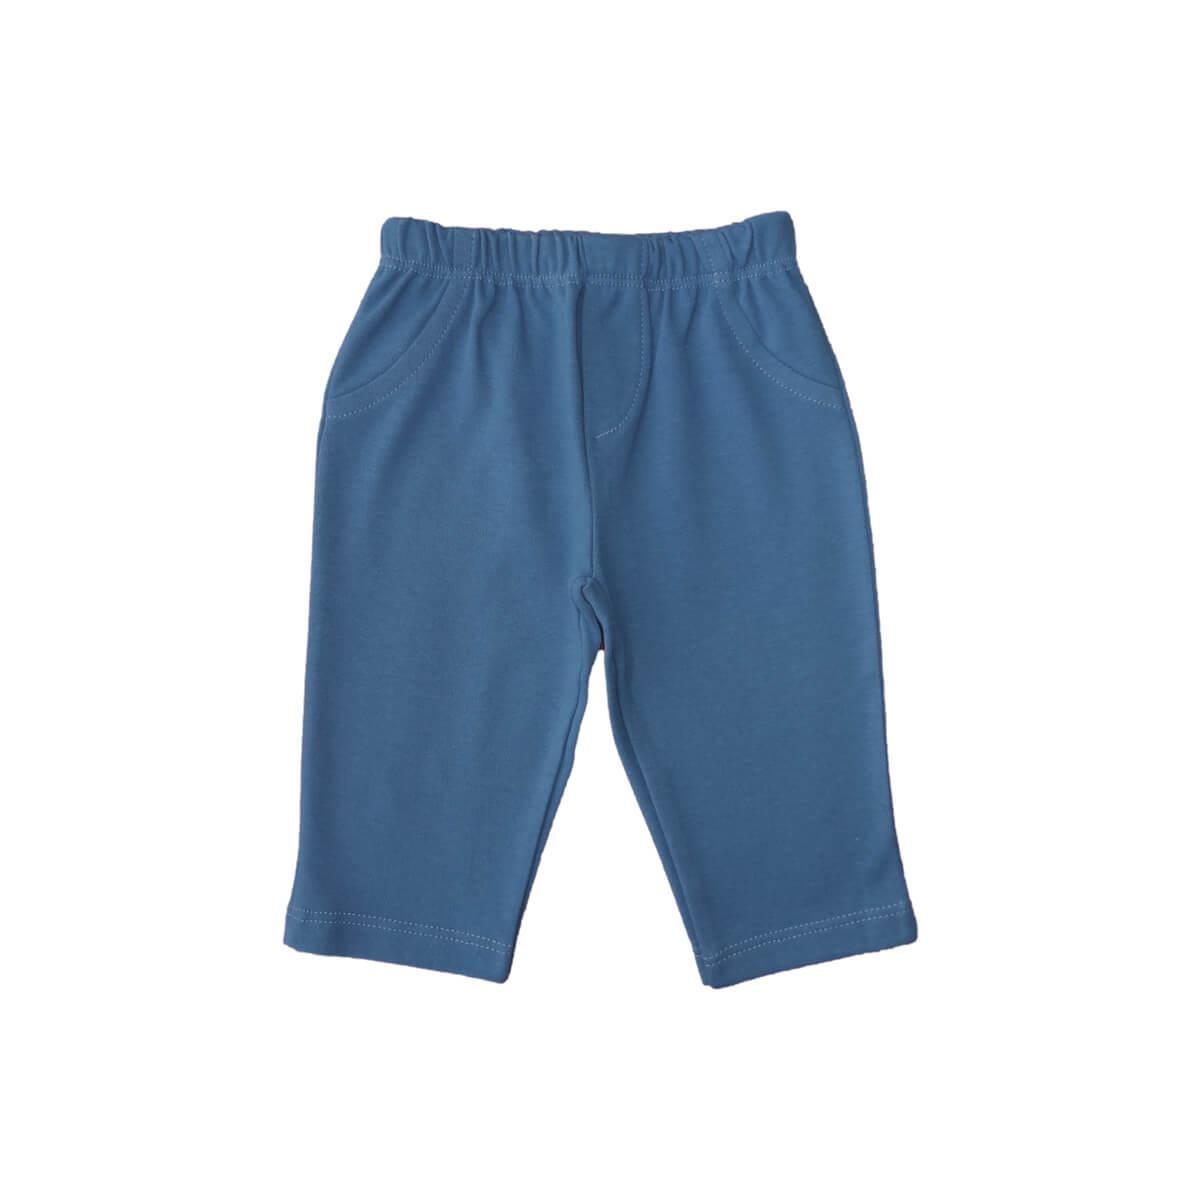 Calça Masculina Azul Denim 1 ao 4